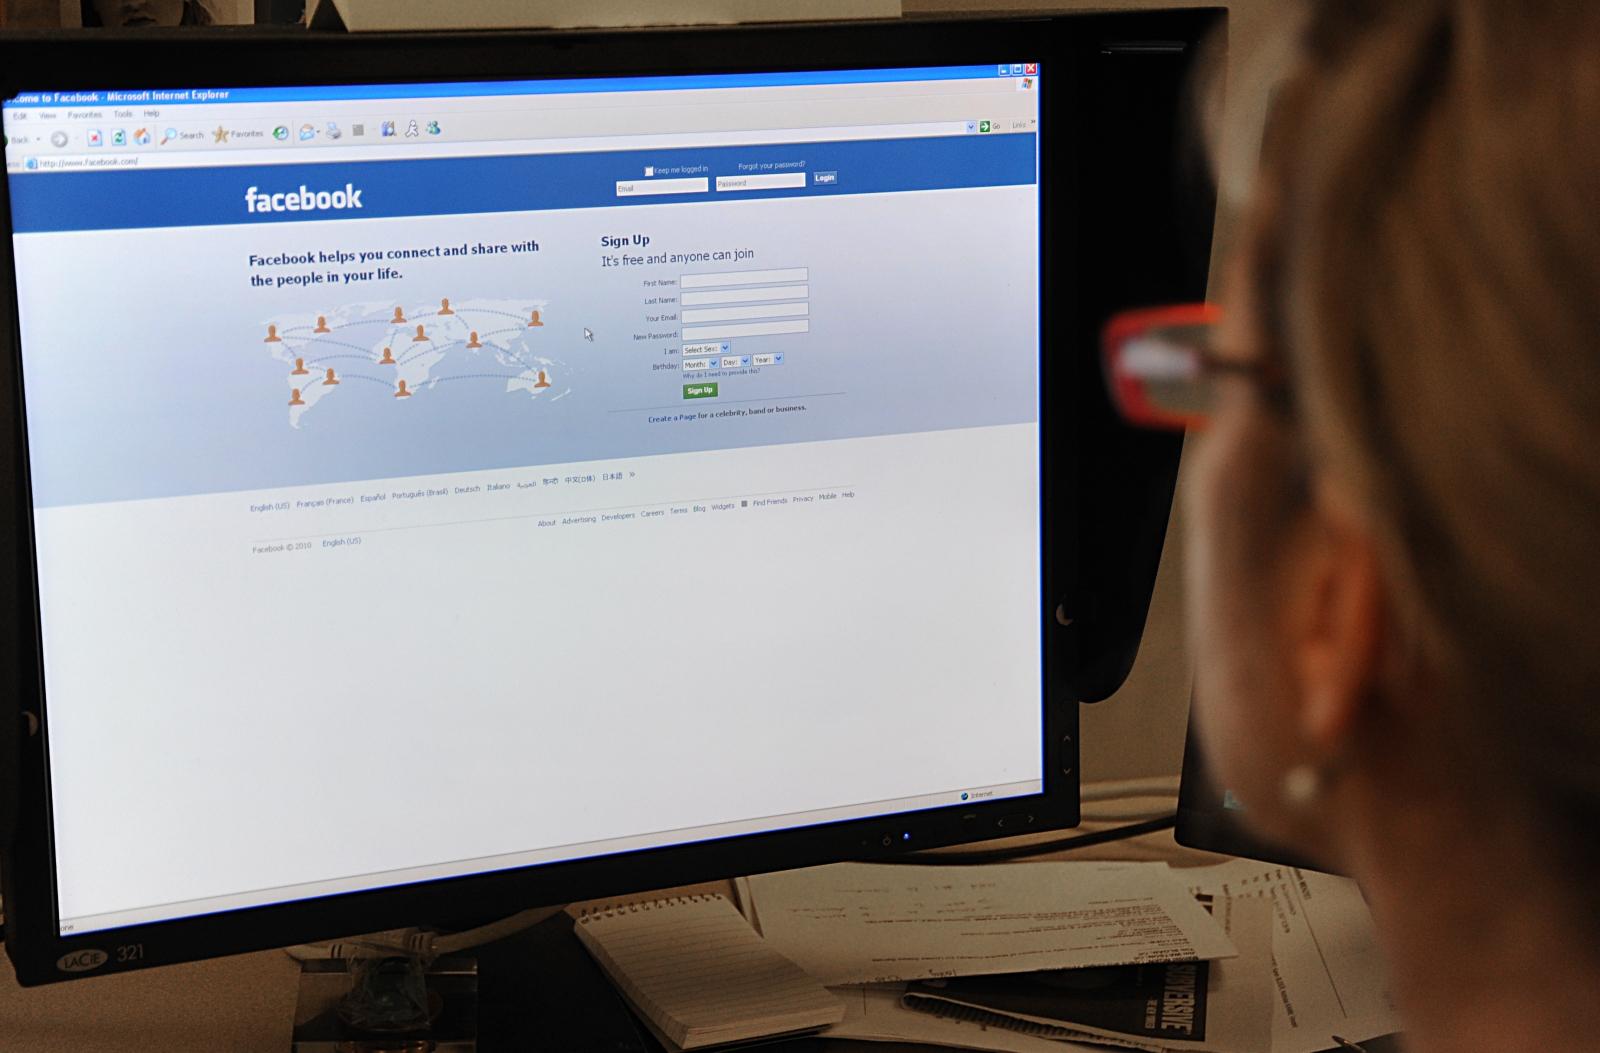 Facebook bypass ad blockers on desktop